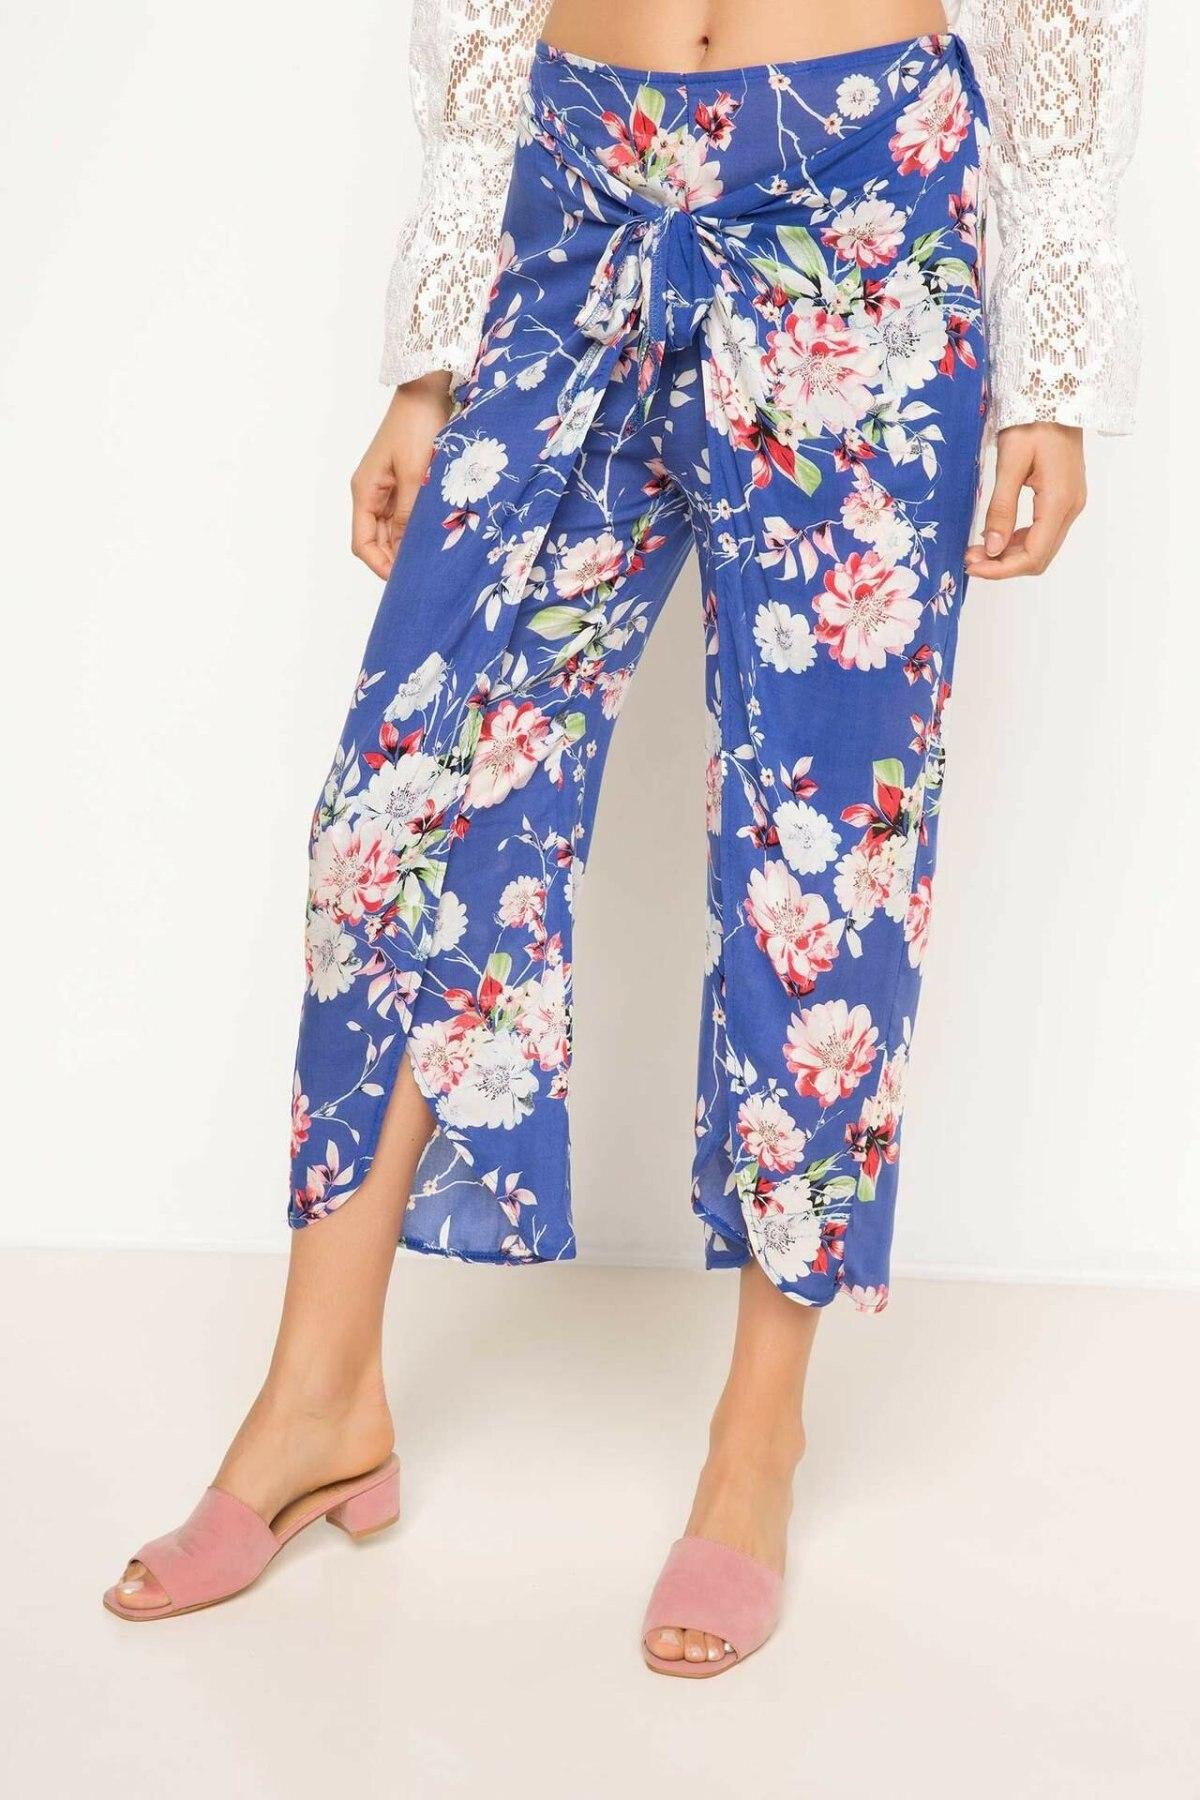 DeFacto Womens Mid Elastic Waist Loose Pants Print Flowers Casual Ladies Breathable Crop Trousers Female Comfort - H9624AZ17HS